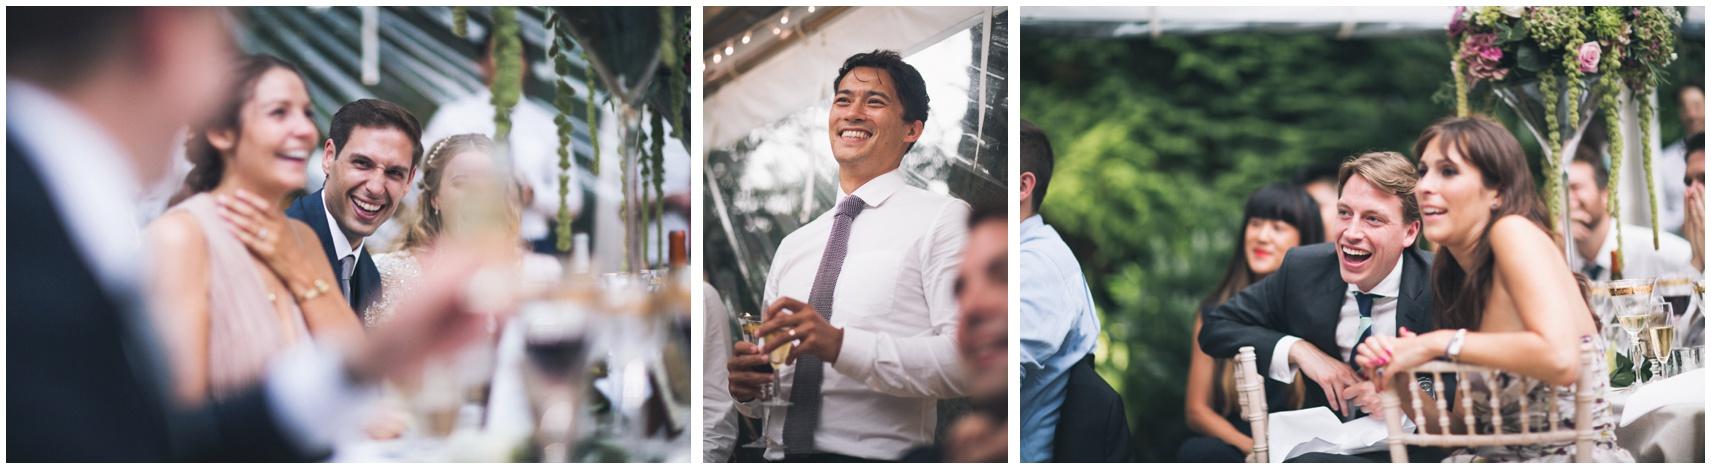 BMC Wedding photography Rutland_0347.jpg